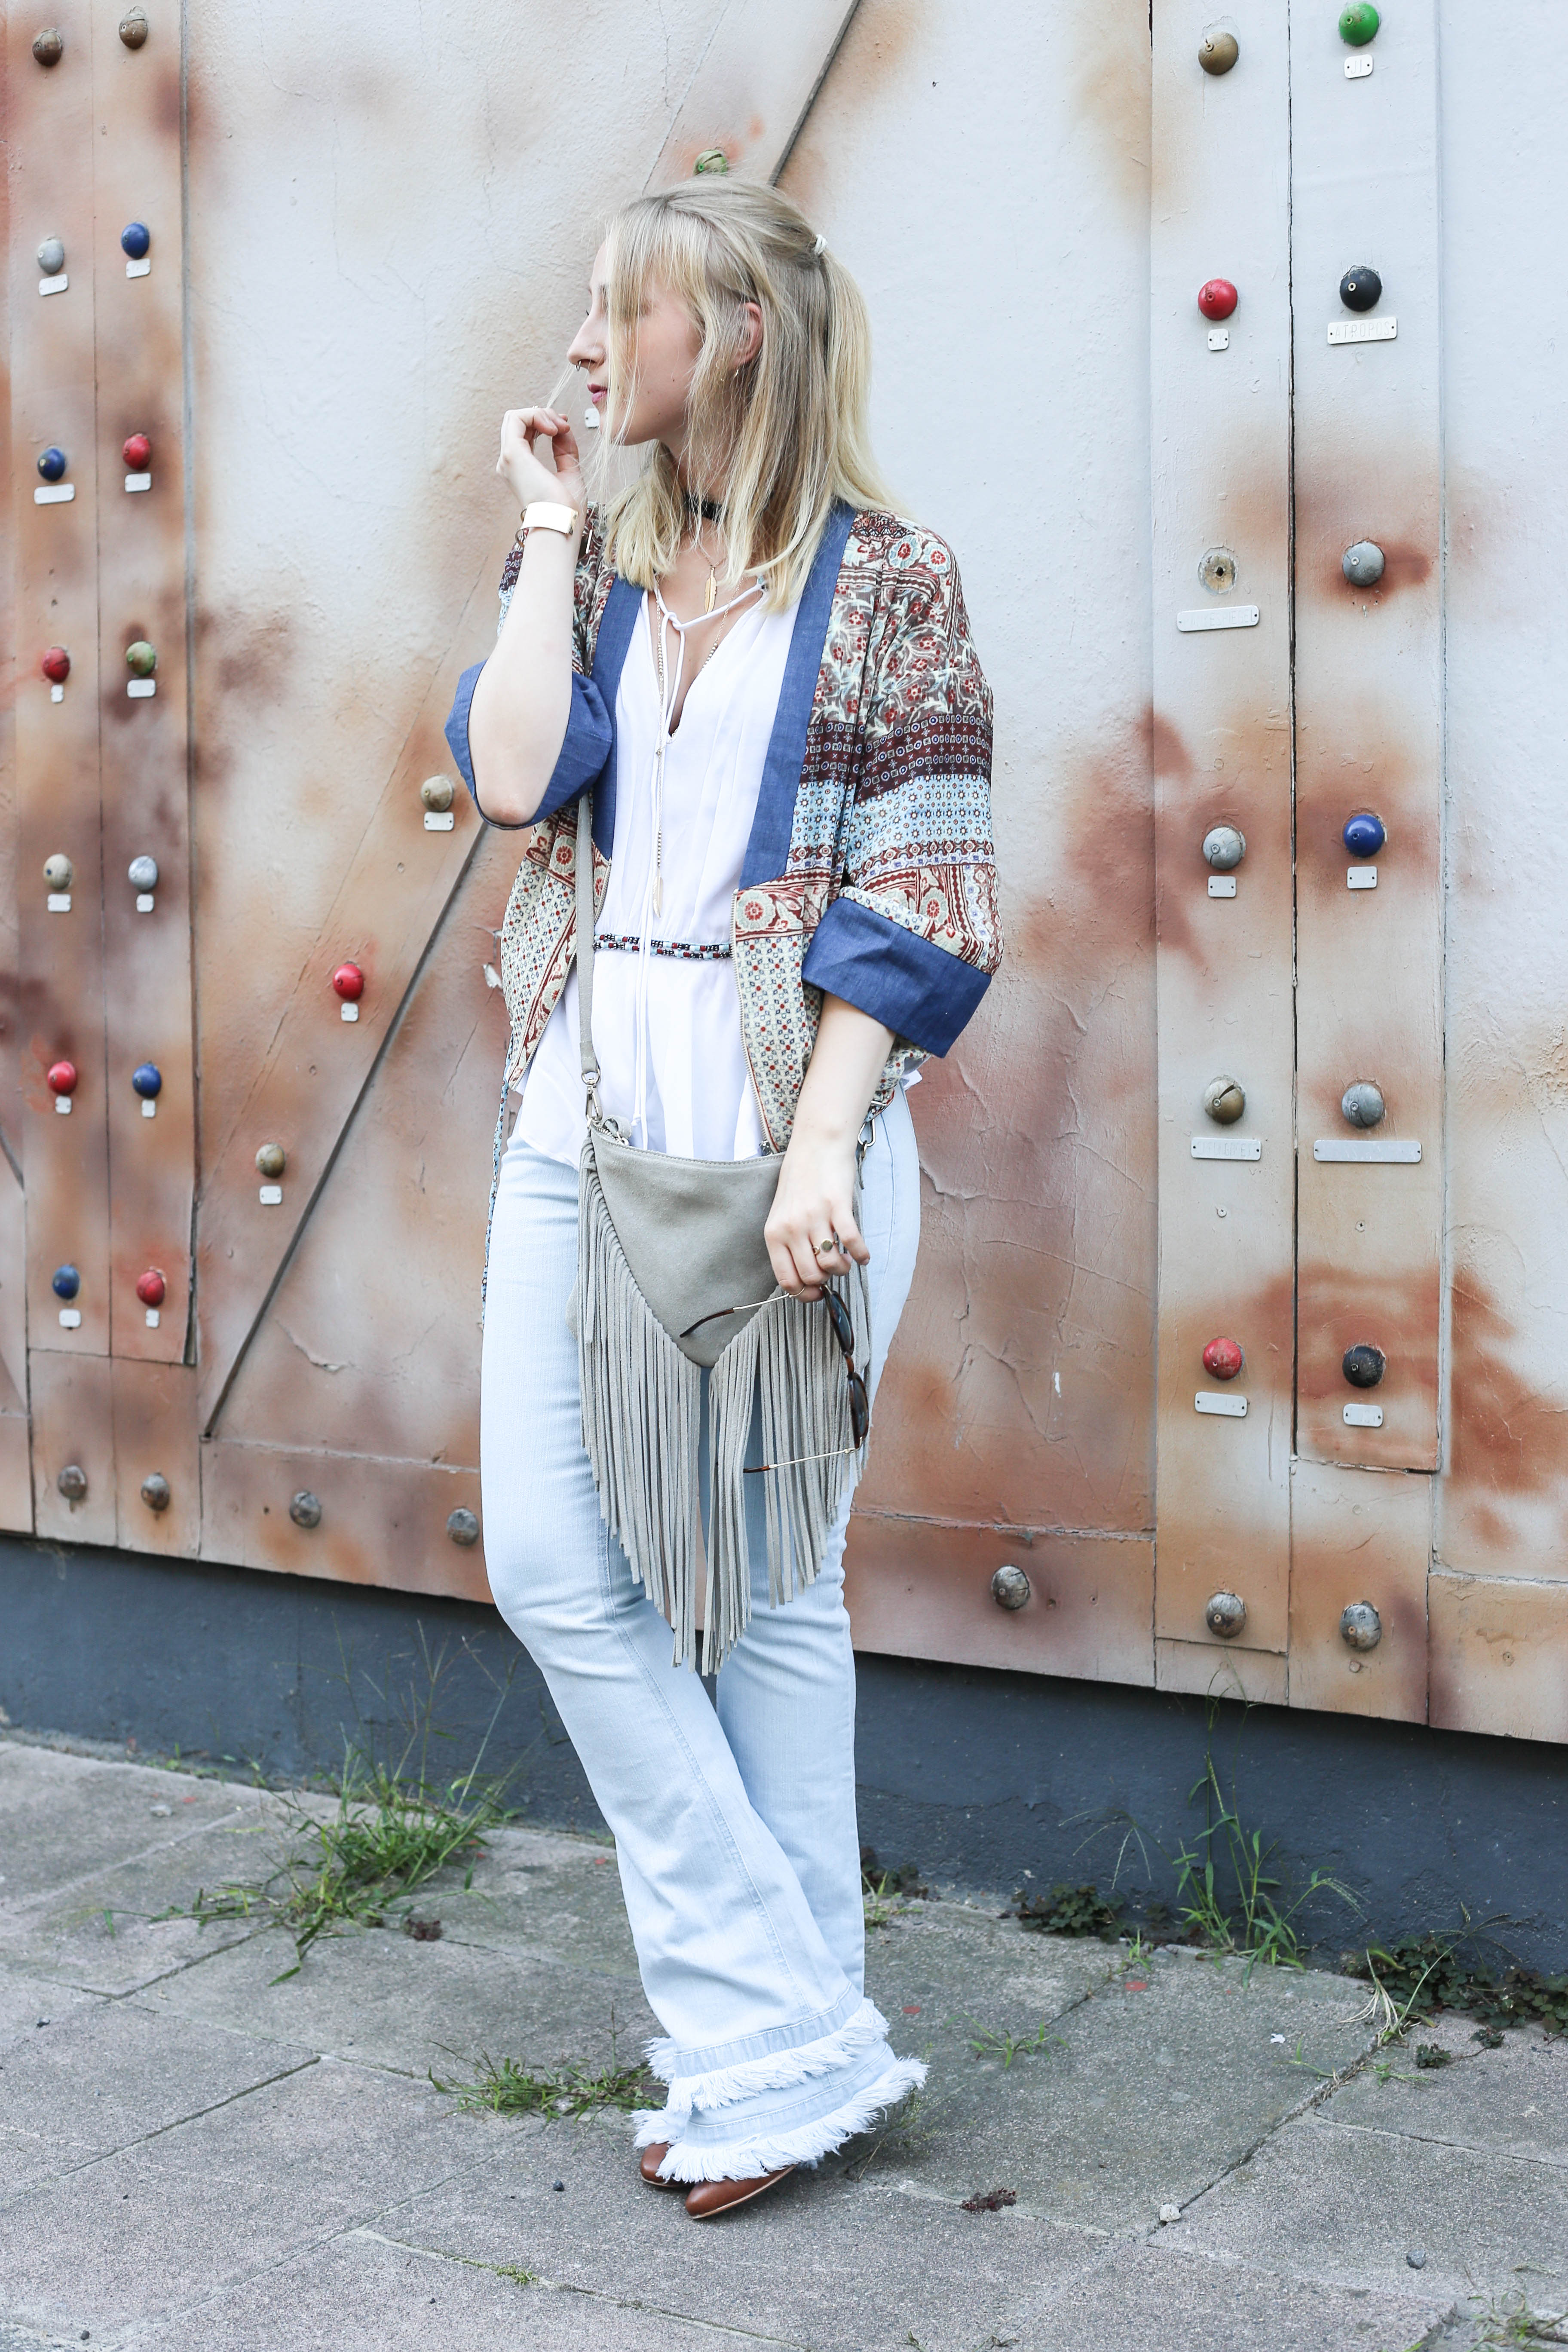 festival-look-fashionblog-berlin-modeblog-outfit-schlaghose-flared-jeans_1662